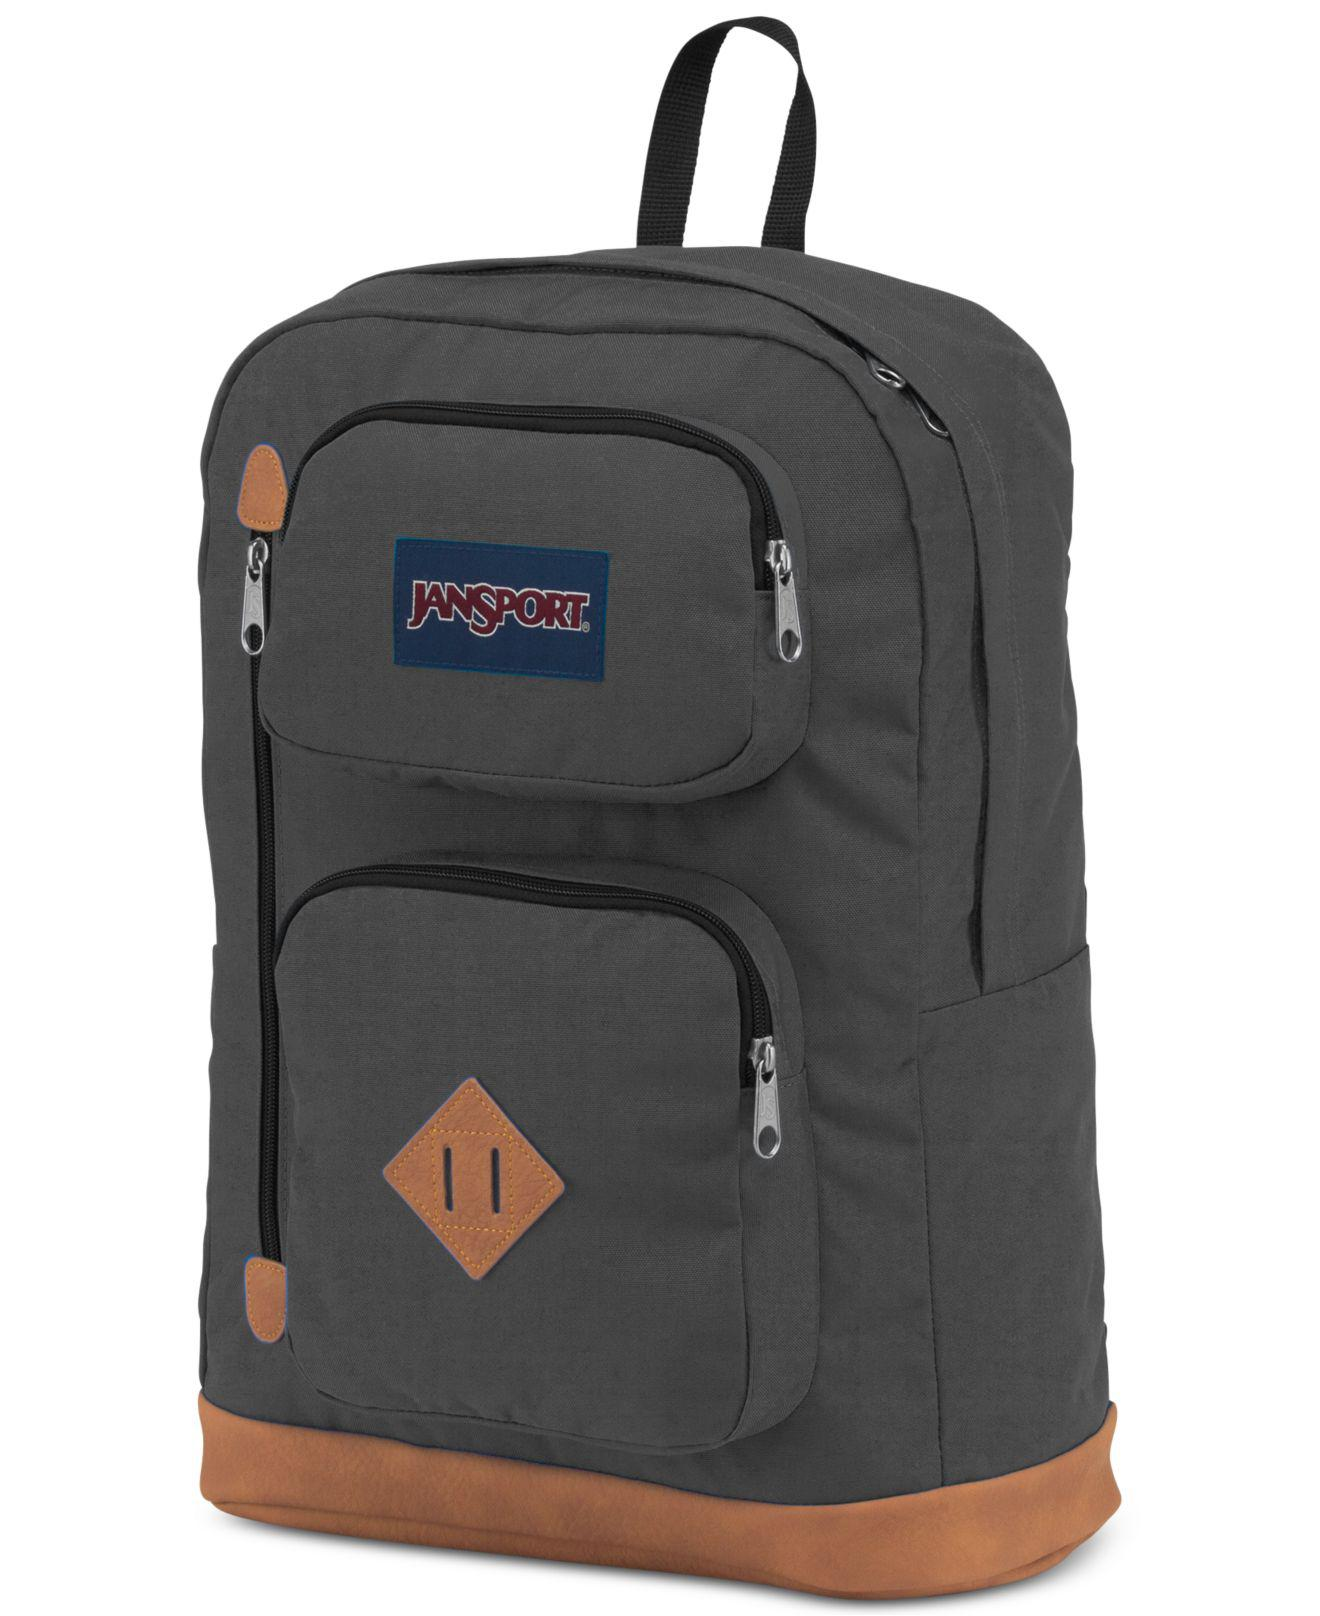 7a1653c5b3 Lyst - Jansport Men s Austin Backpack in Gray for Men